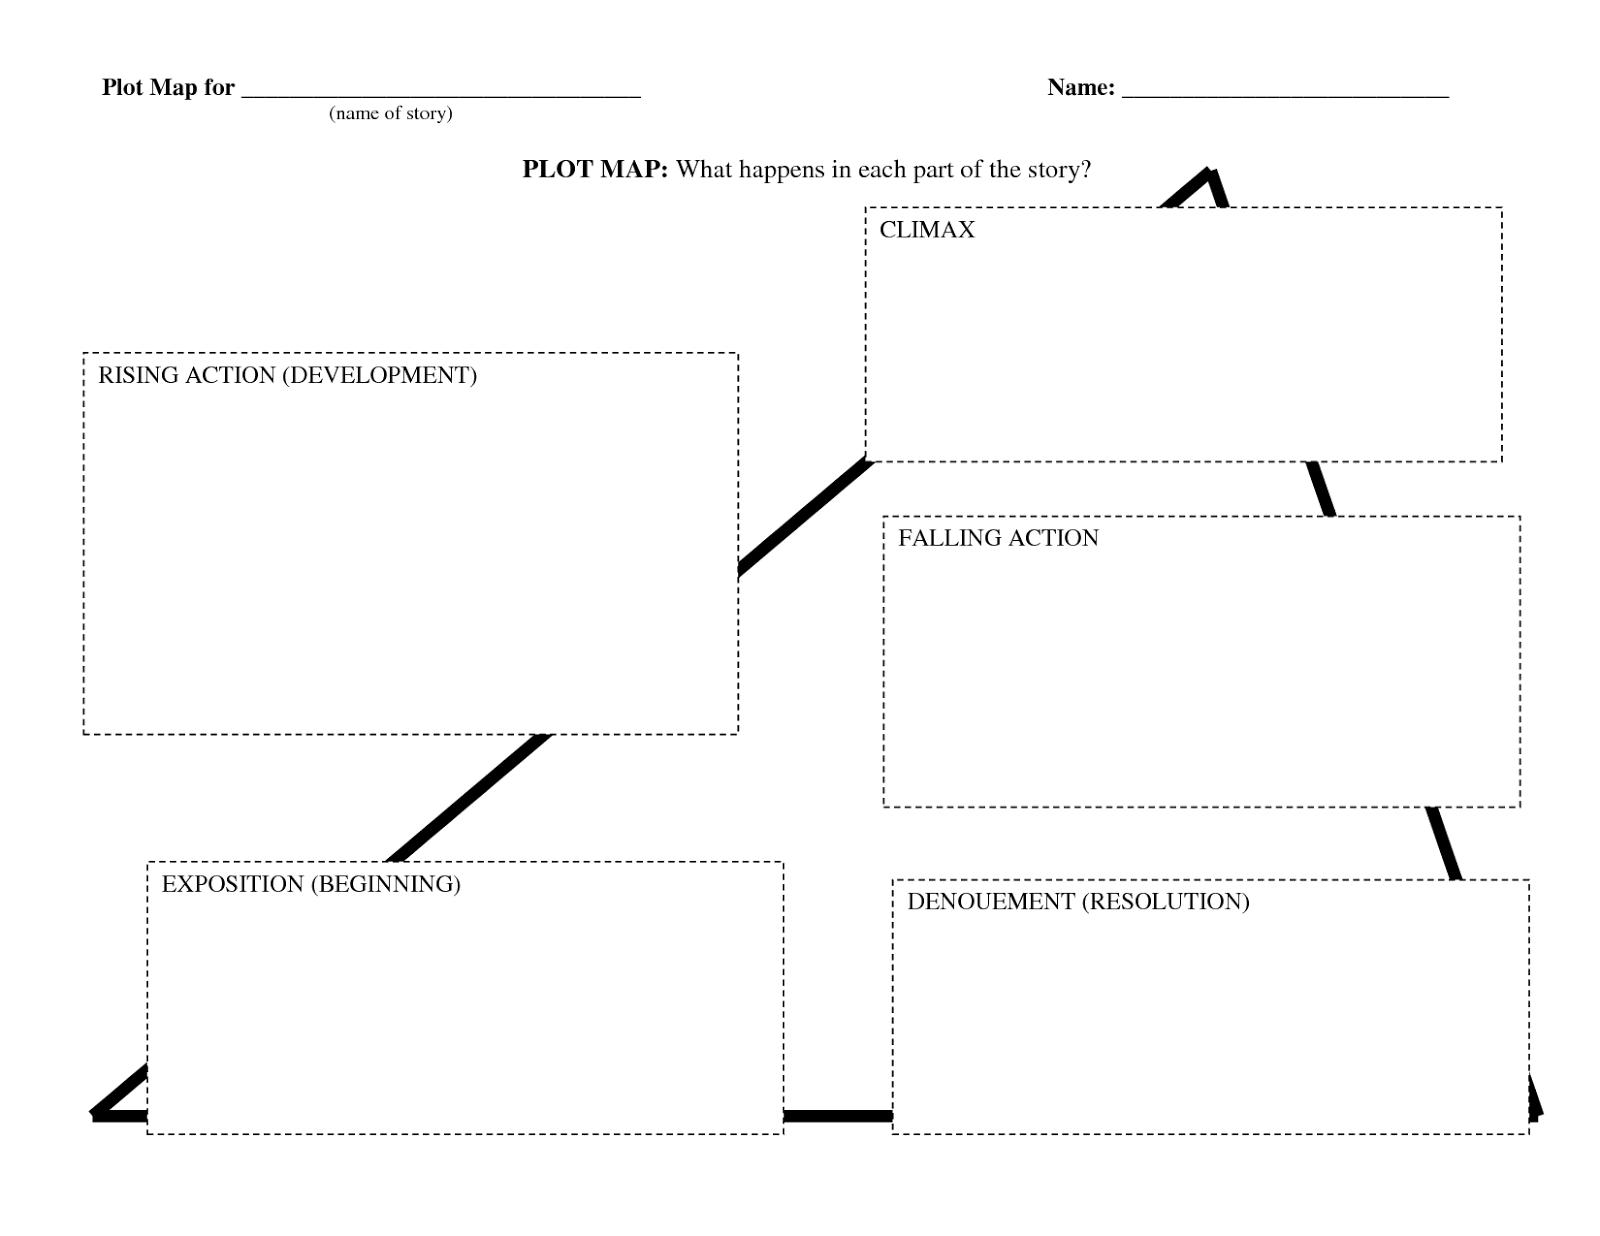 medium resolution of di croce st simon dec 18 novel study plot diagram prezi rh stsimondicroce blogspot com printable plot diagram story plot diagram example